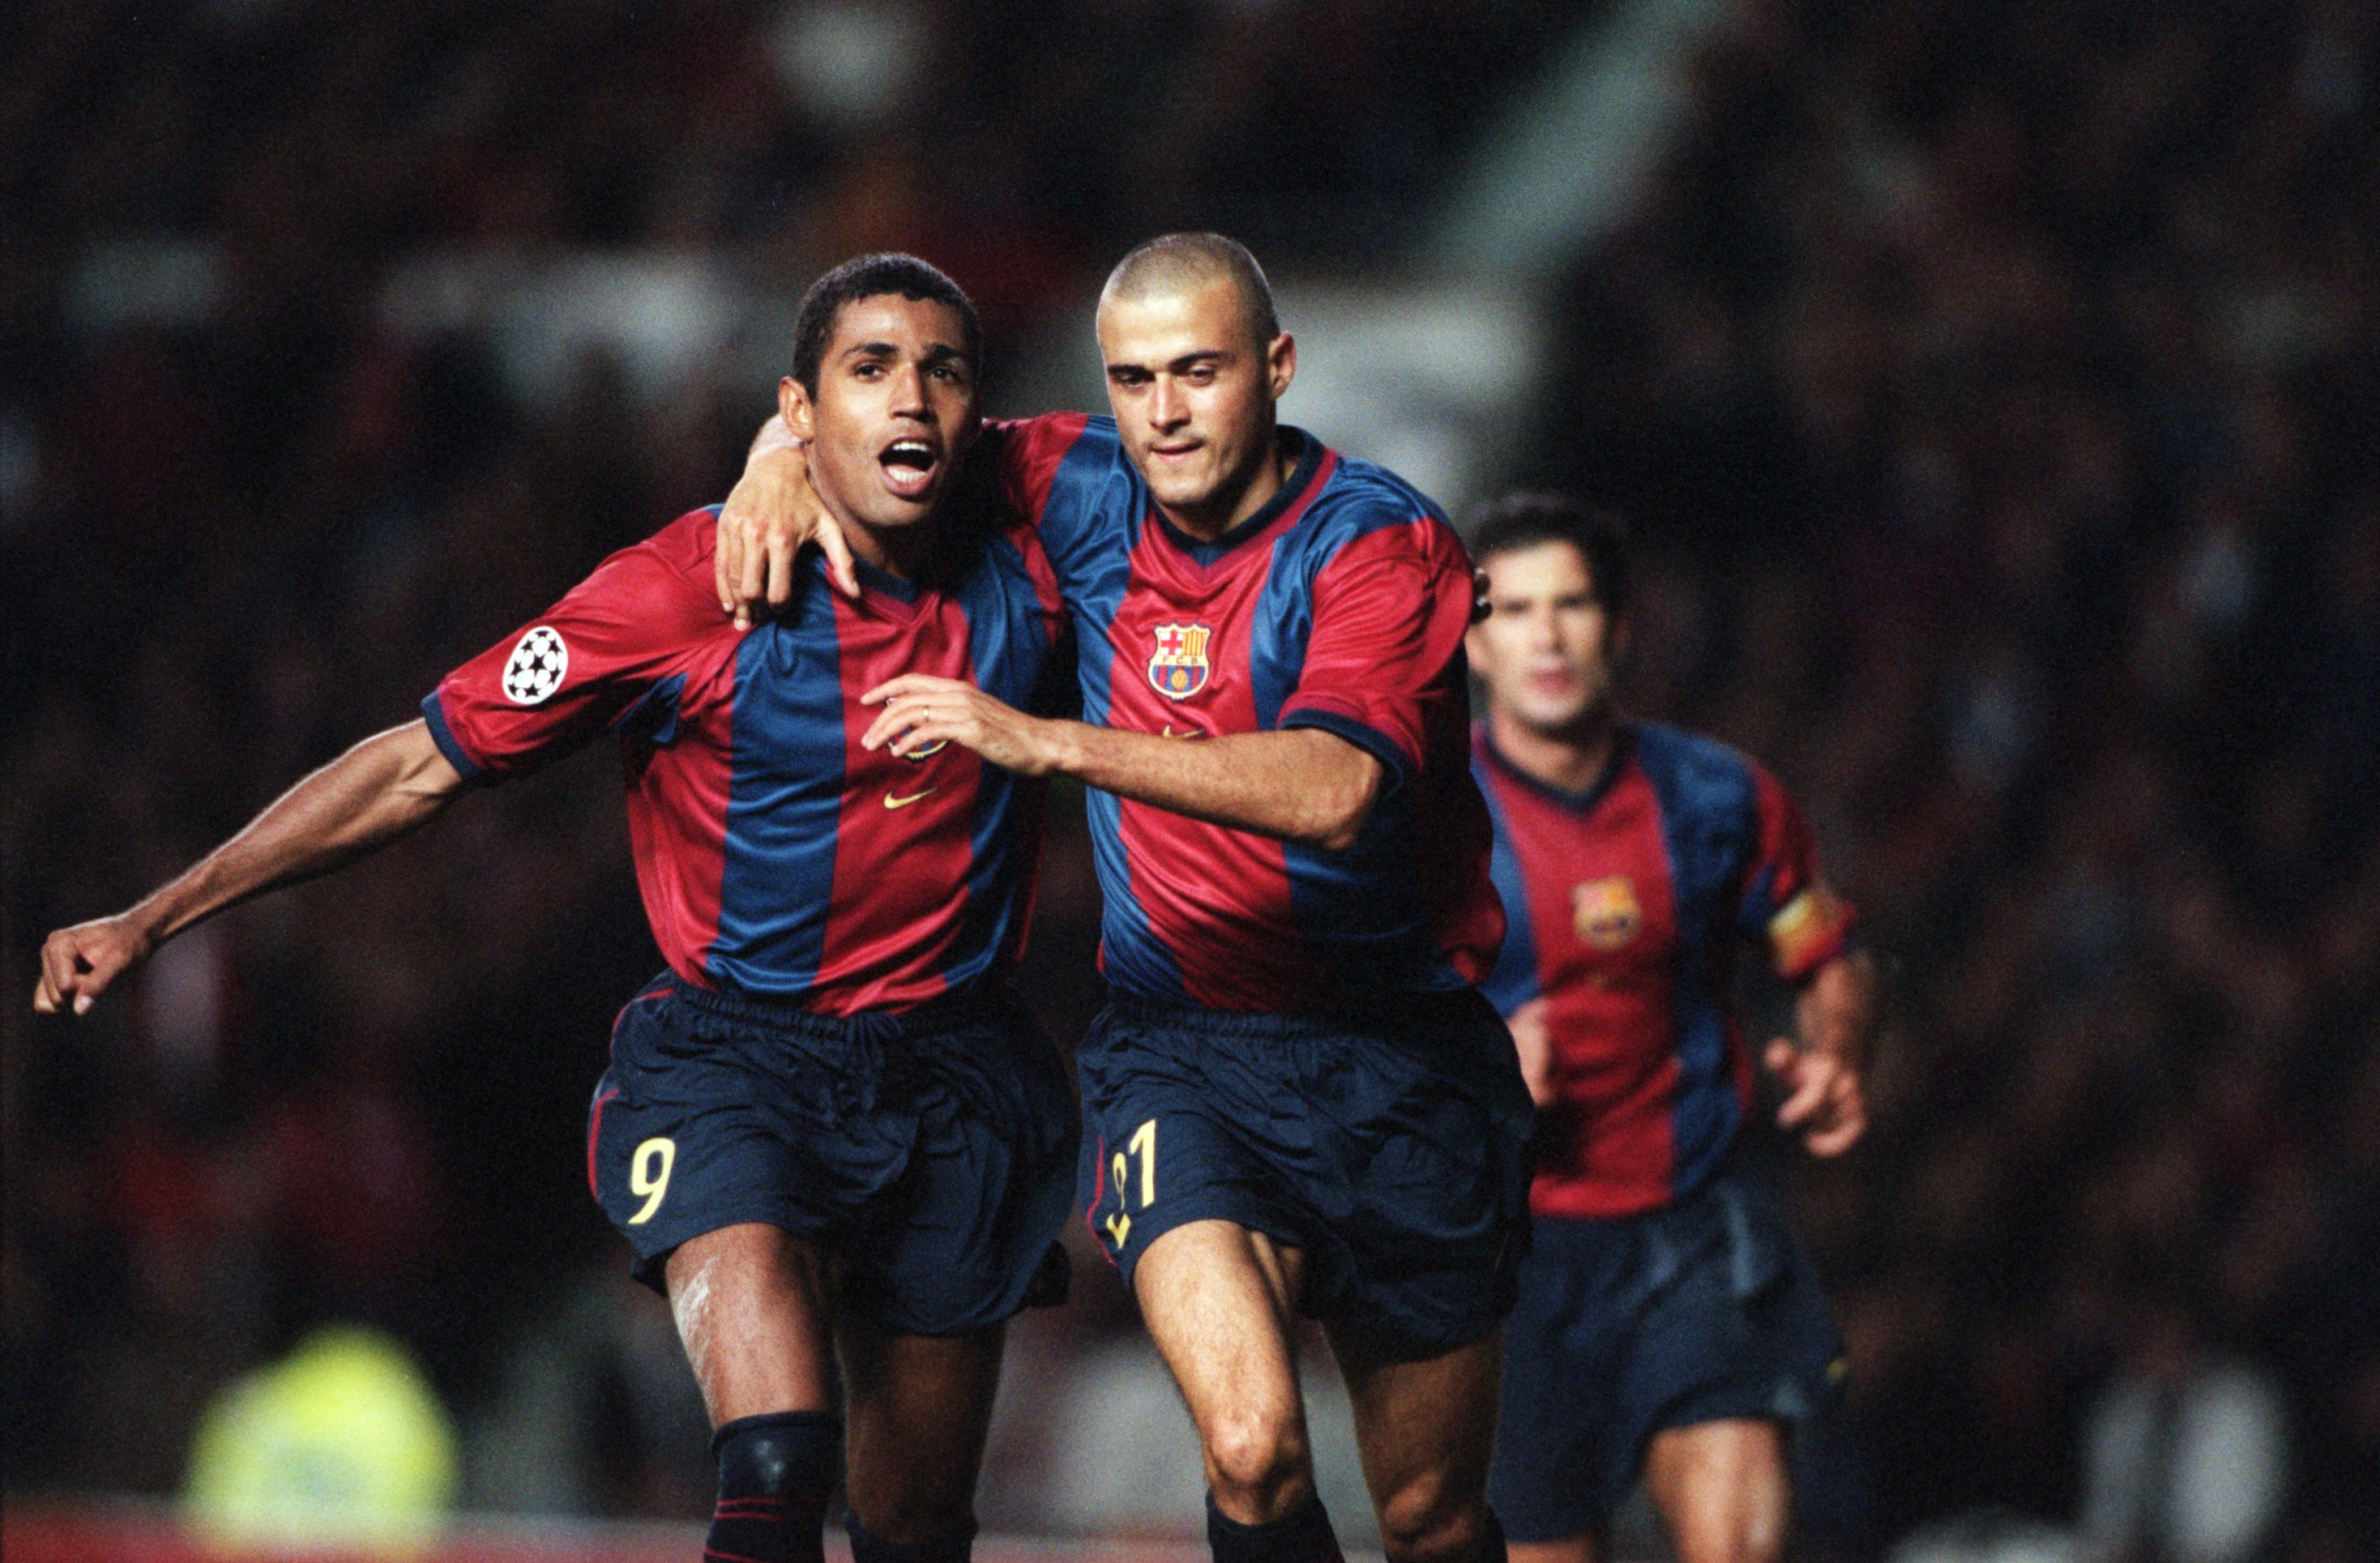 d2e429d397e Barcelona To Wear A Special Anniversary Kit For El Clasico - SPORTbible